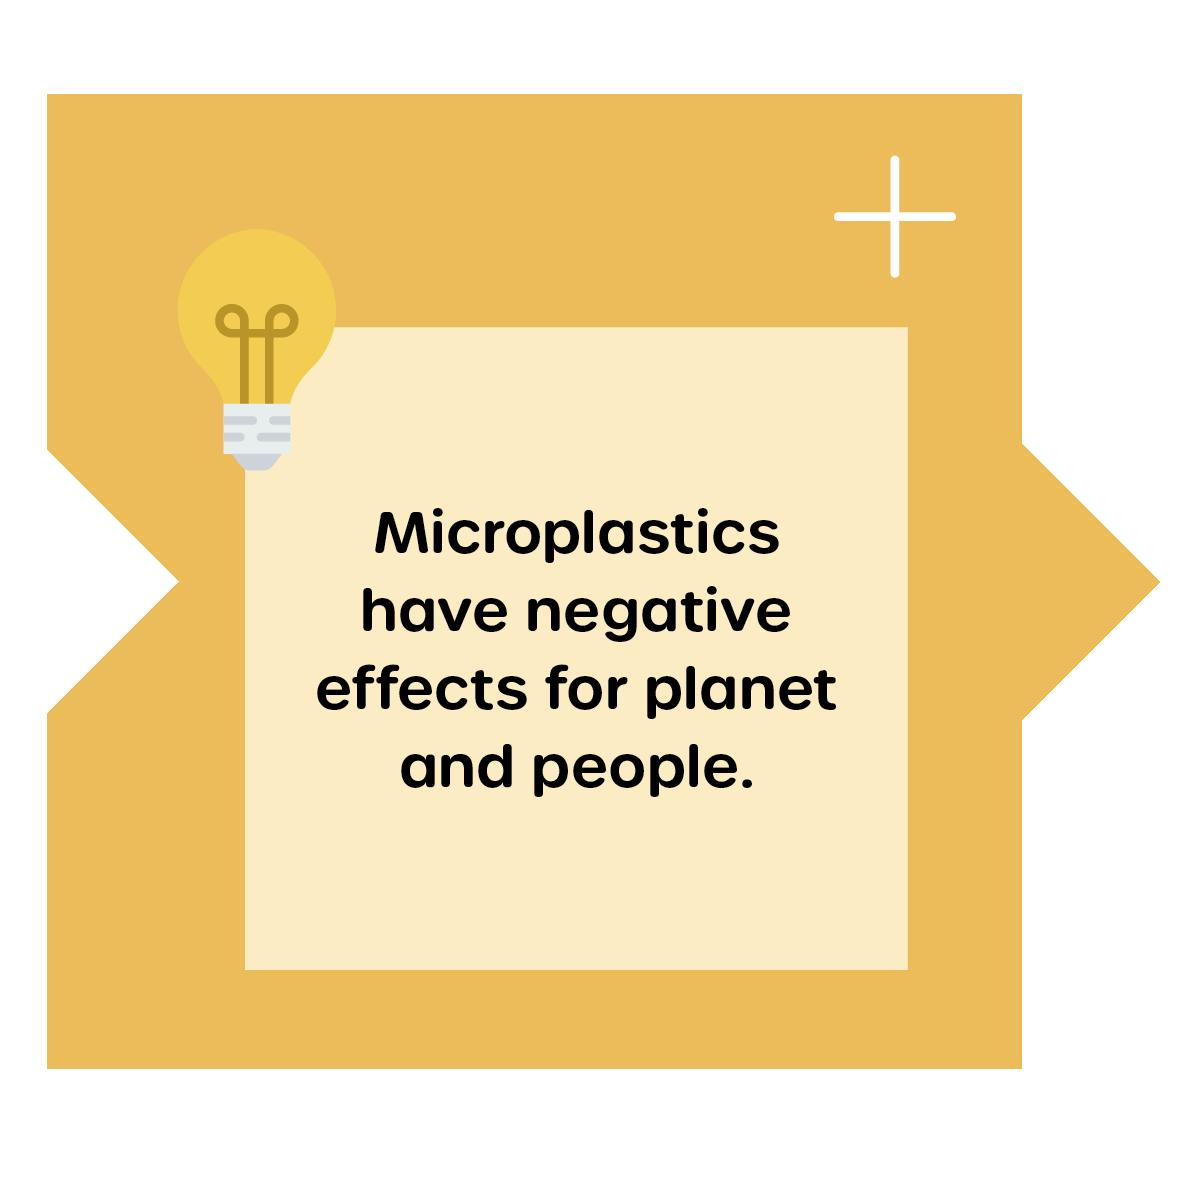 Negative effects of microplastics